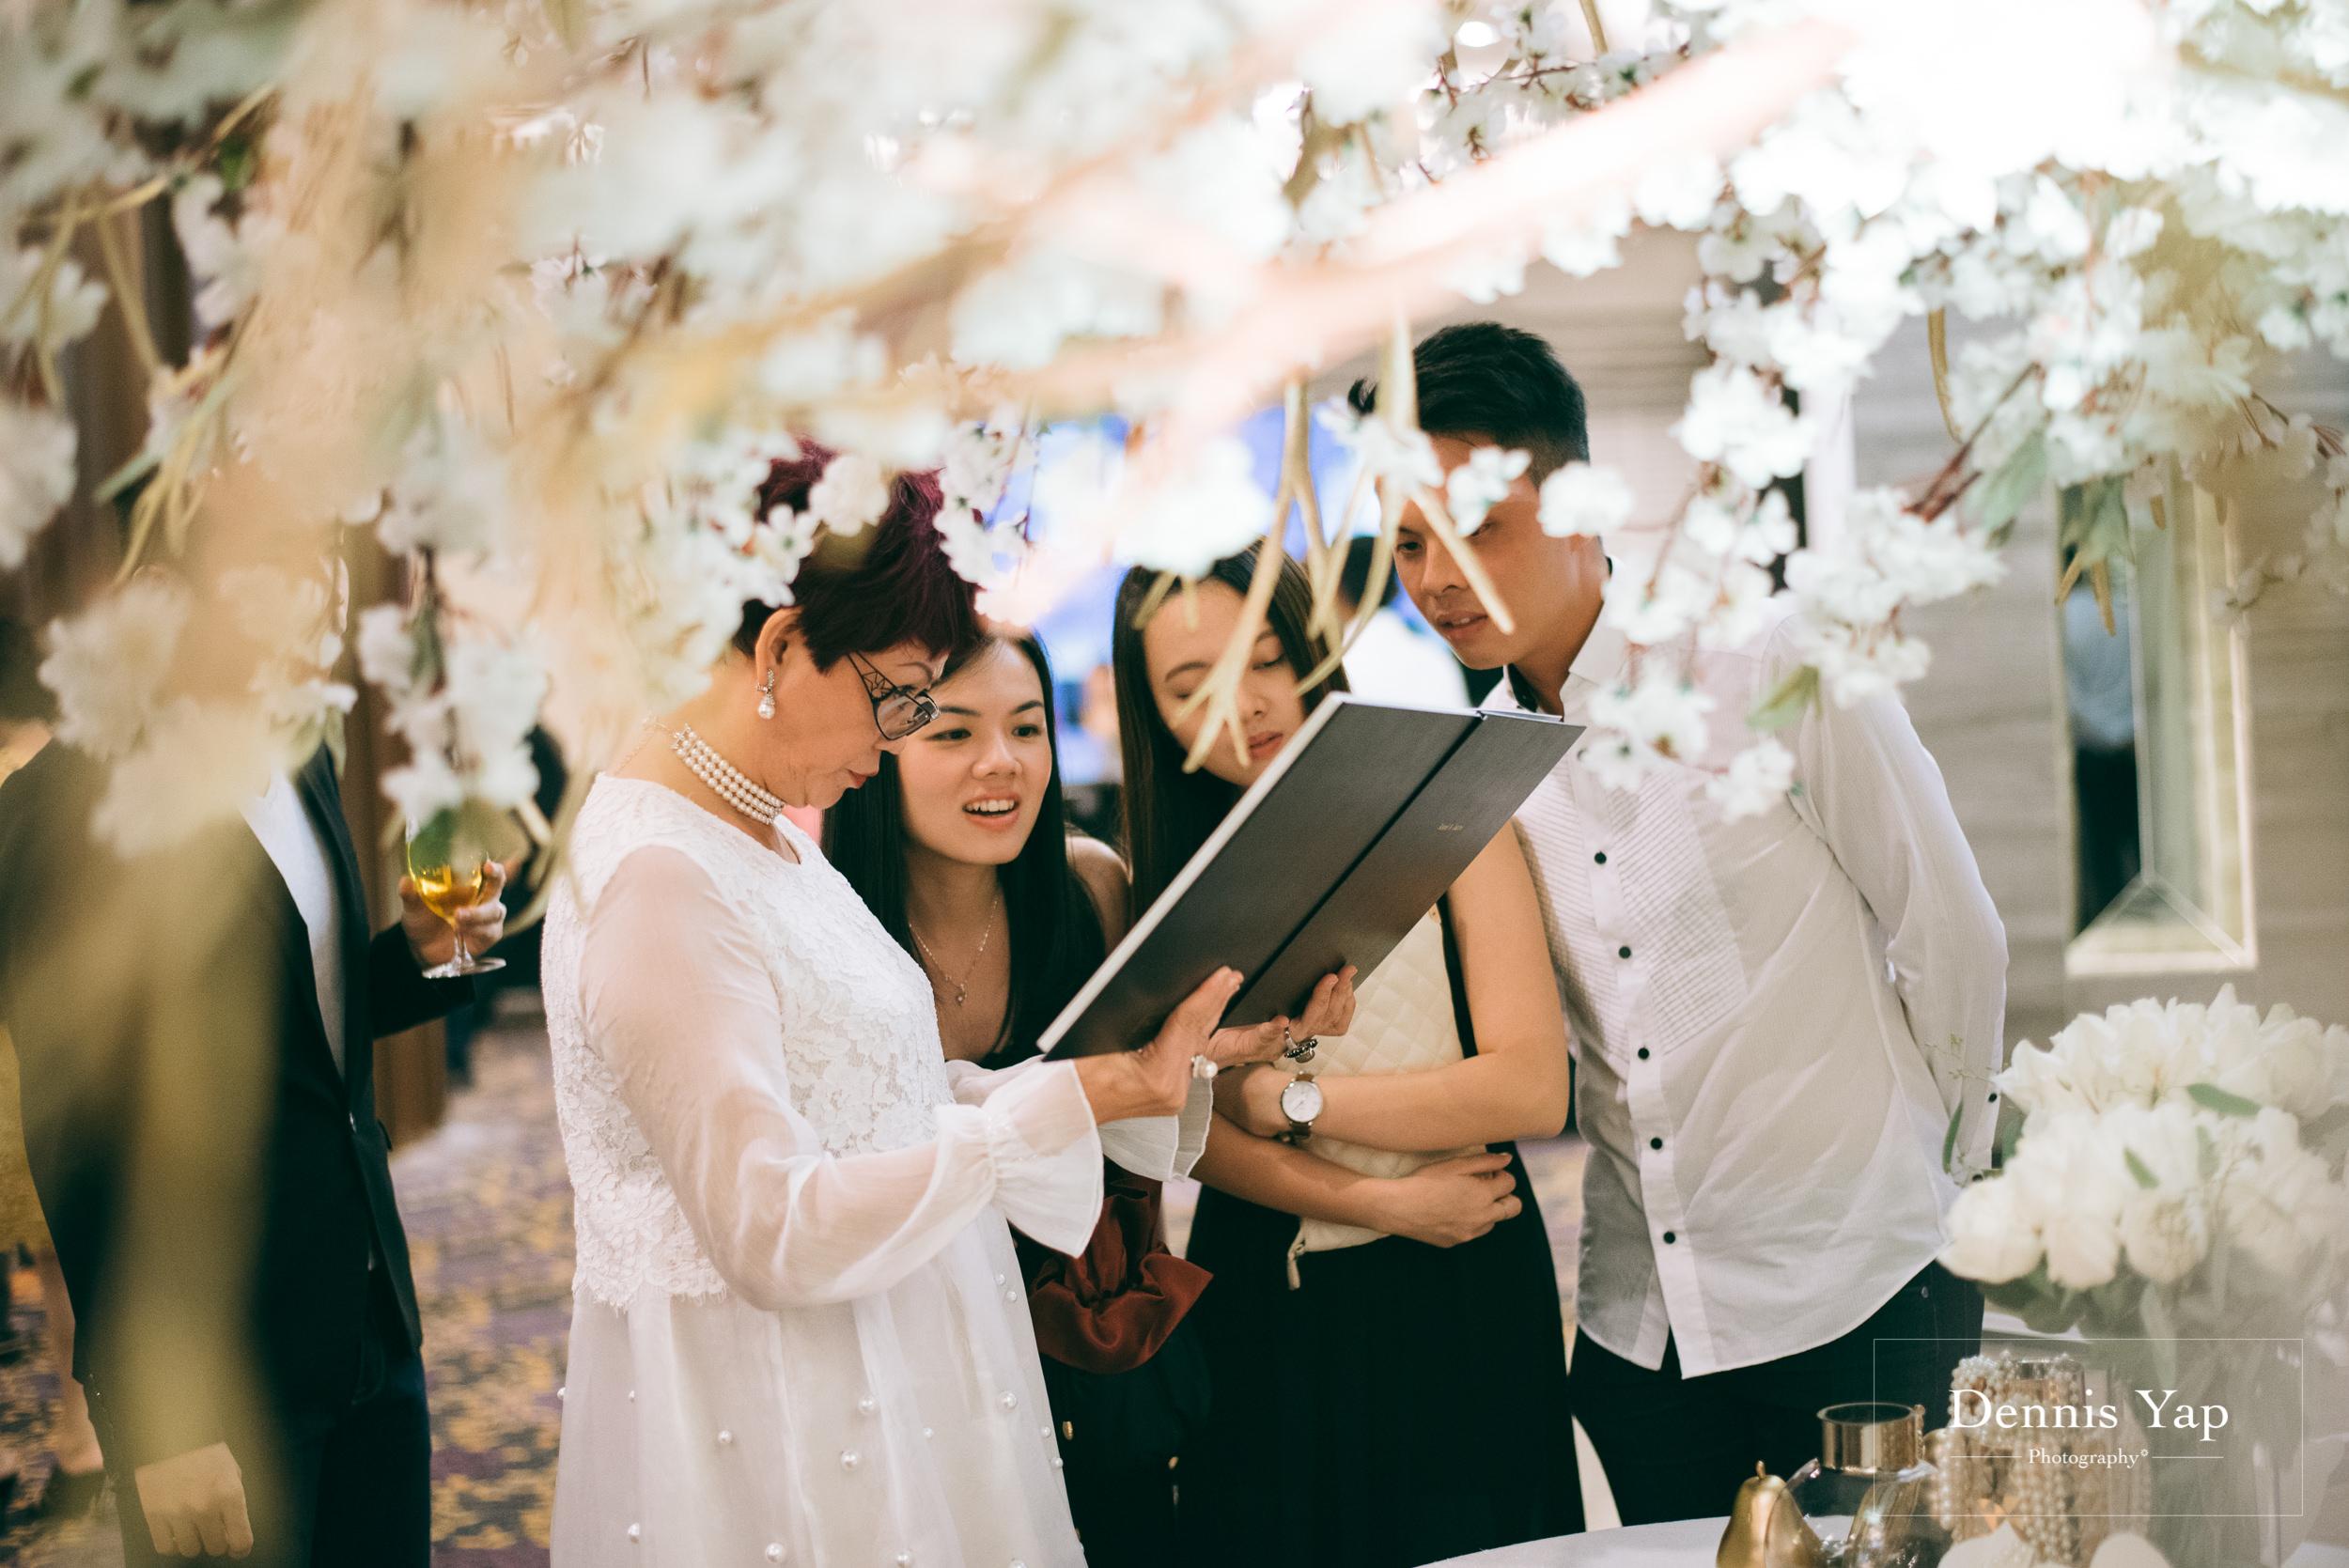 lionel joanne garden wedding majestic hotel dennis yap photography malaysia top wedding photographer-74.jpg